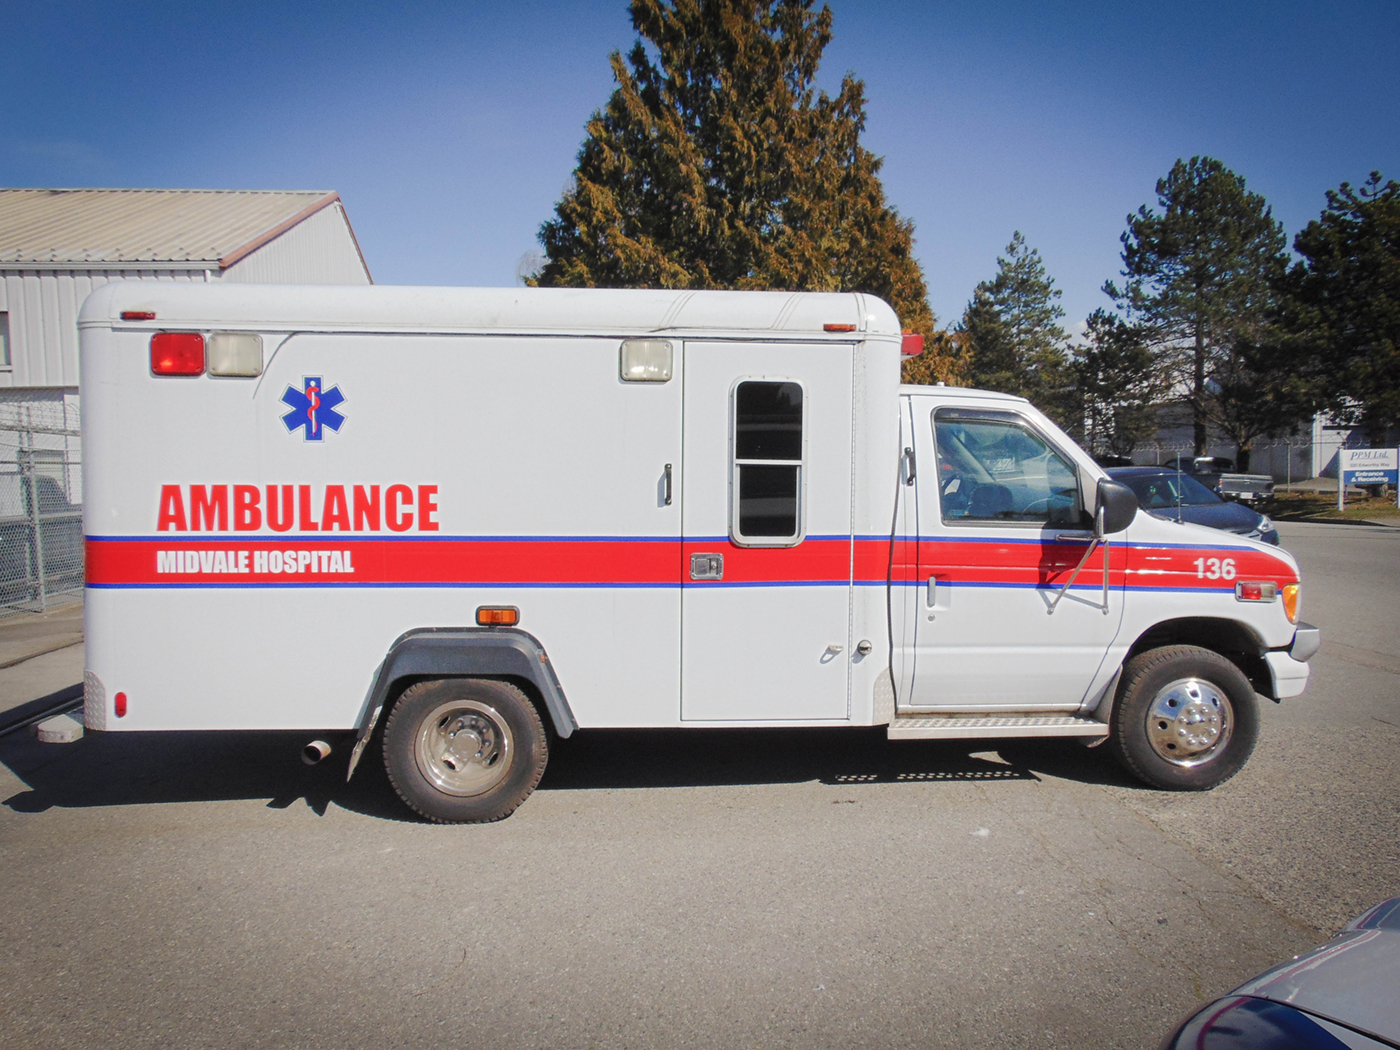 2001 Ford Ambulance Rental